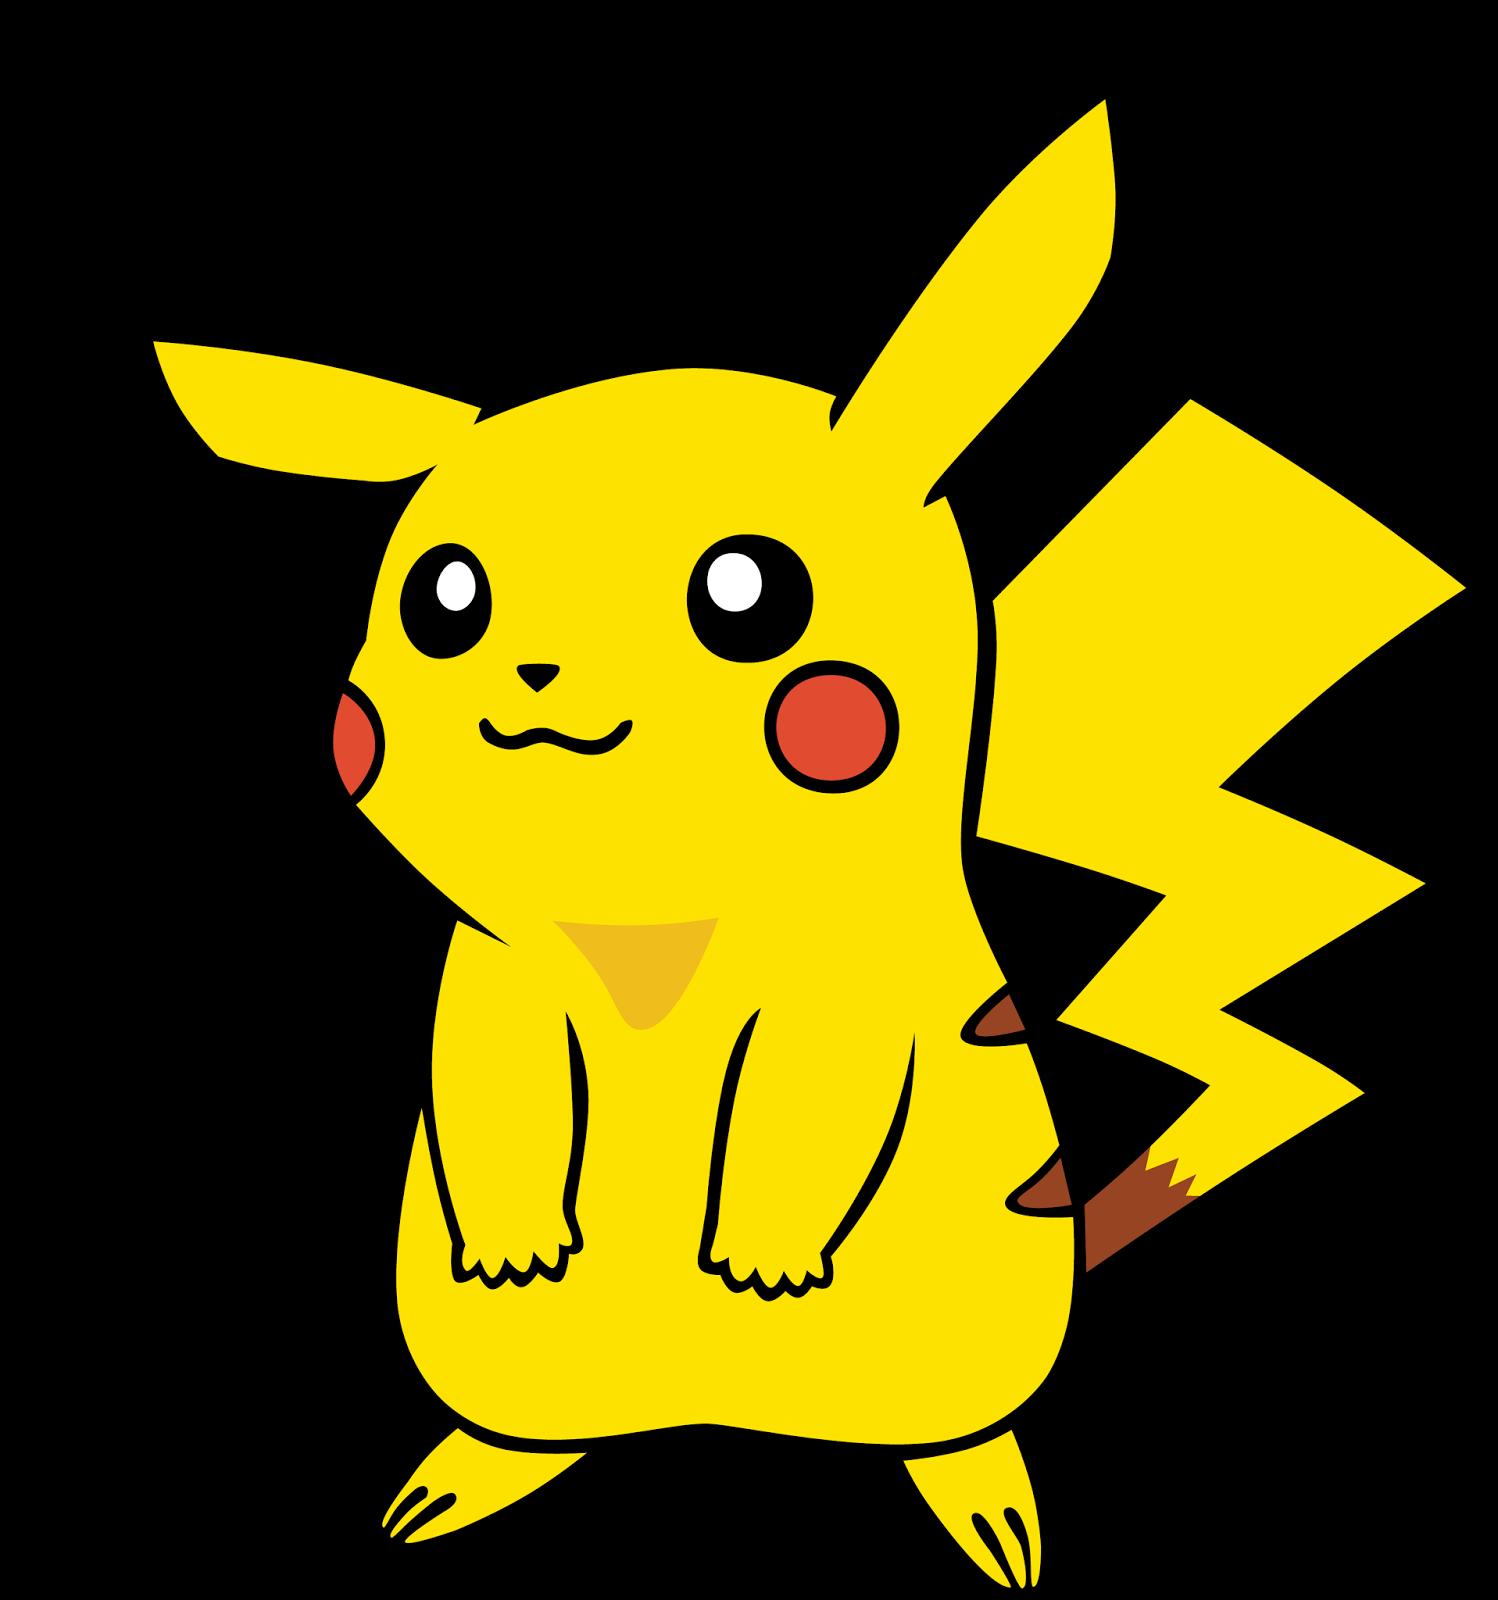 Radiation snowflake clipart vector free library Pokemon Go - Galeria de Imagens   Pinterest   Vector clipart ... vector free library